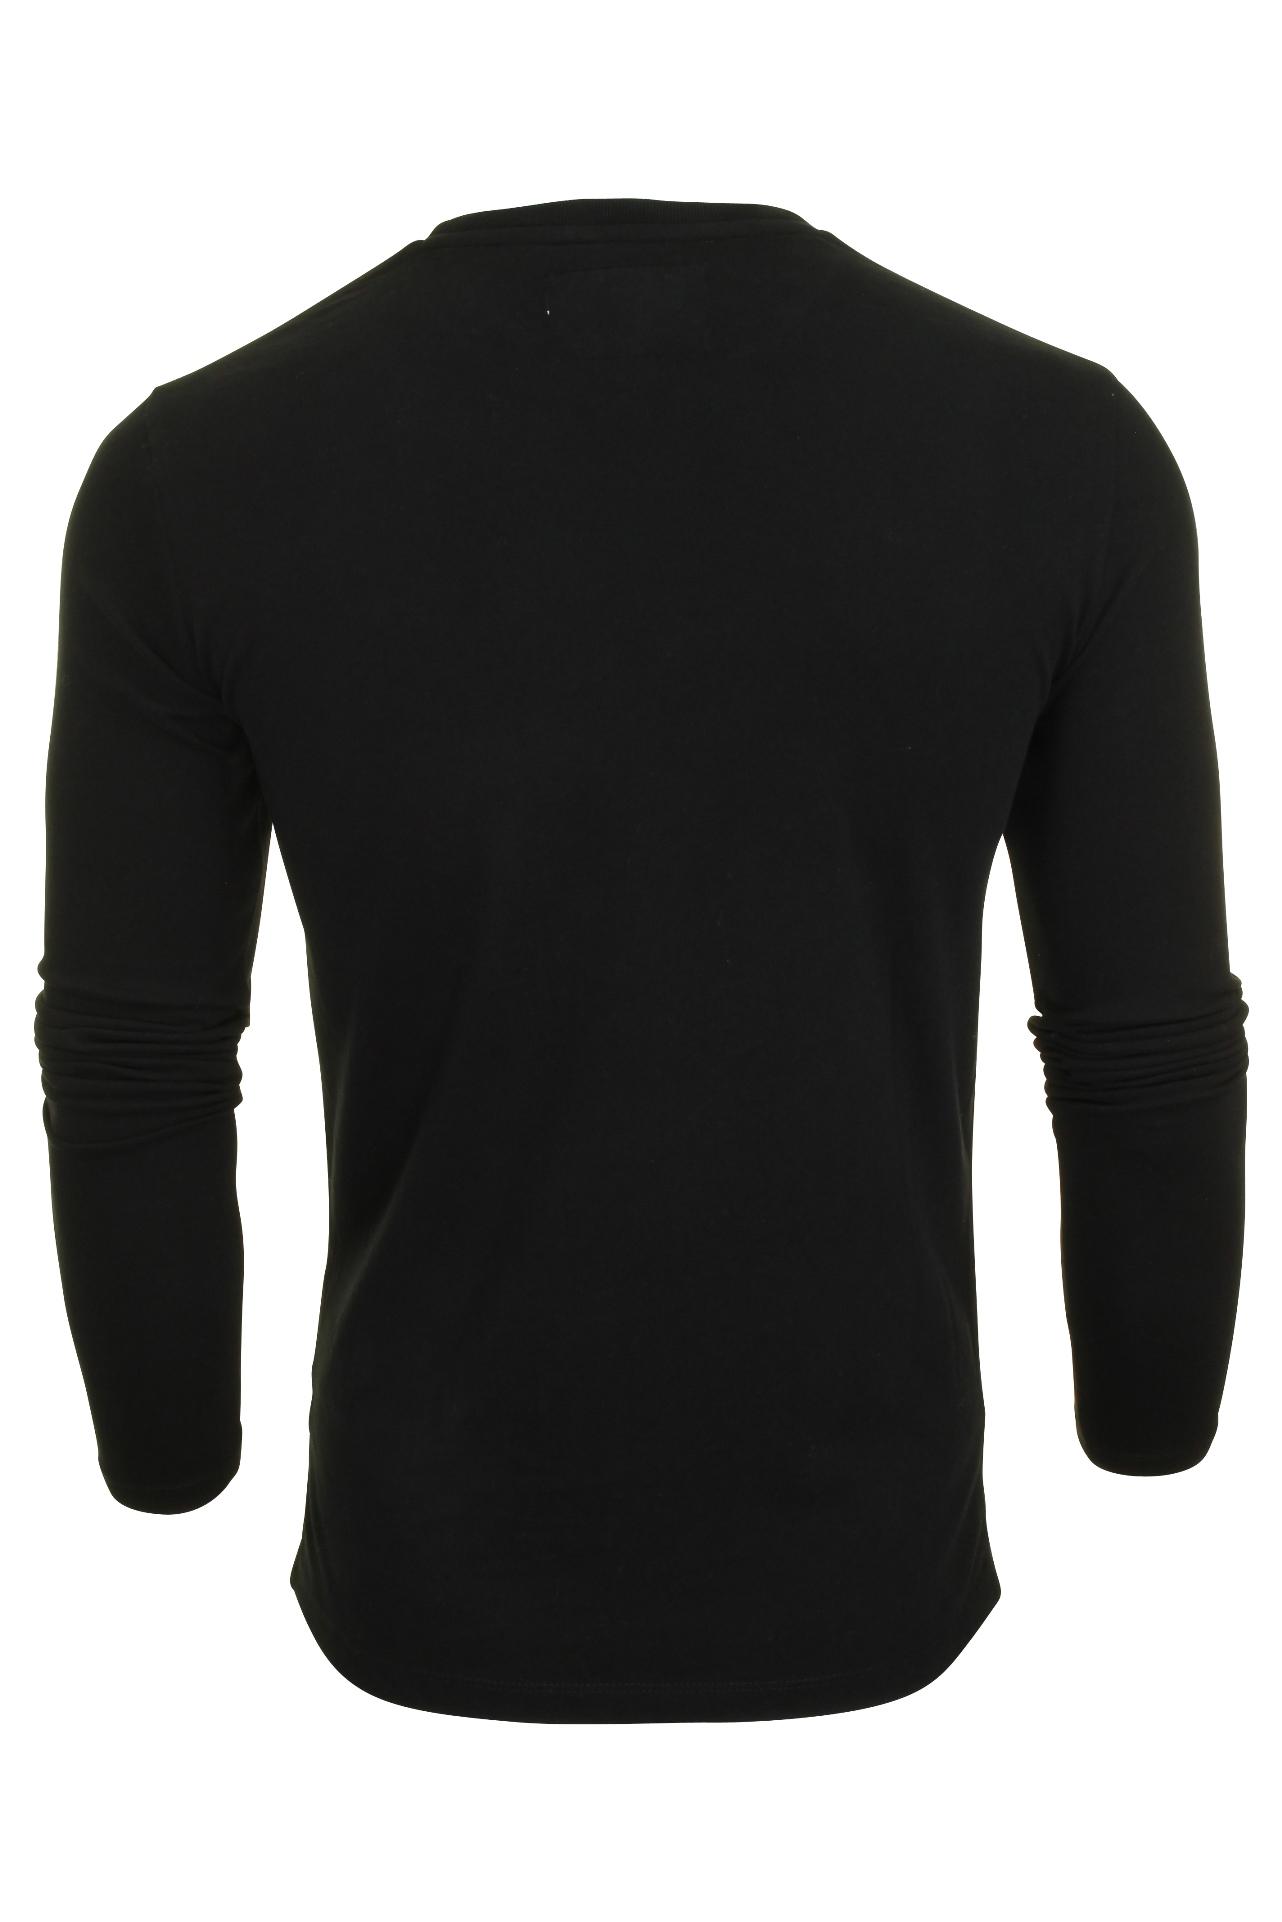 Superdry-Mens-039-Orange-Label-Vintage-039-T-Shirt-Long-Sleeved thumbnail 5